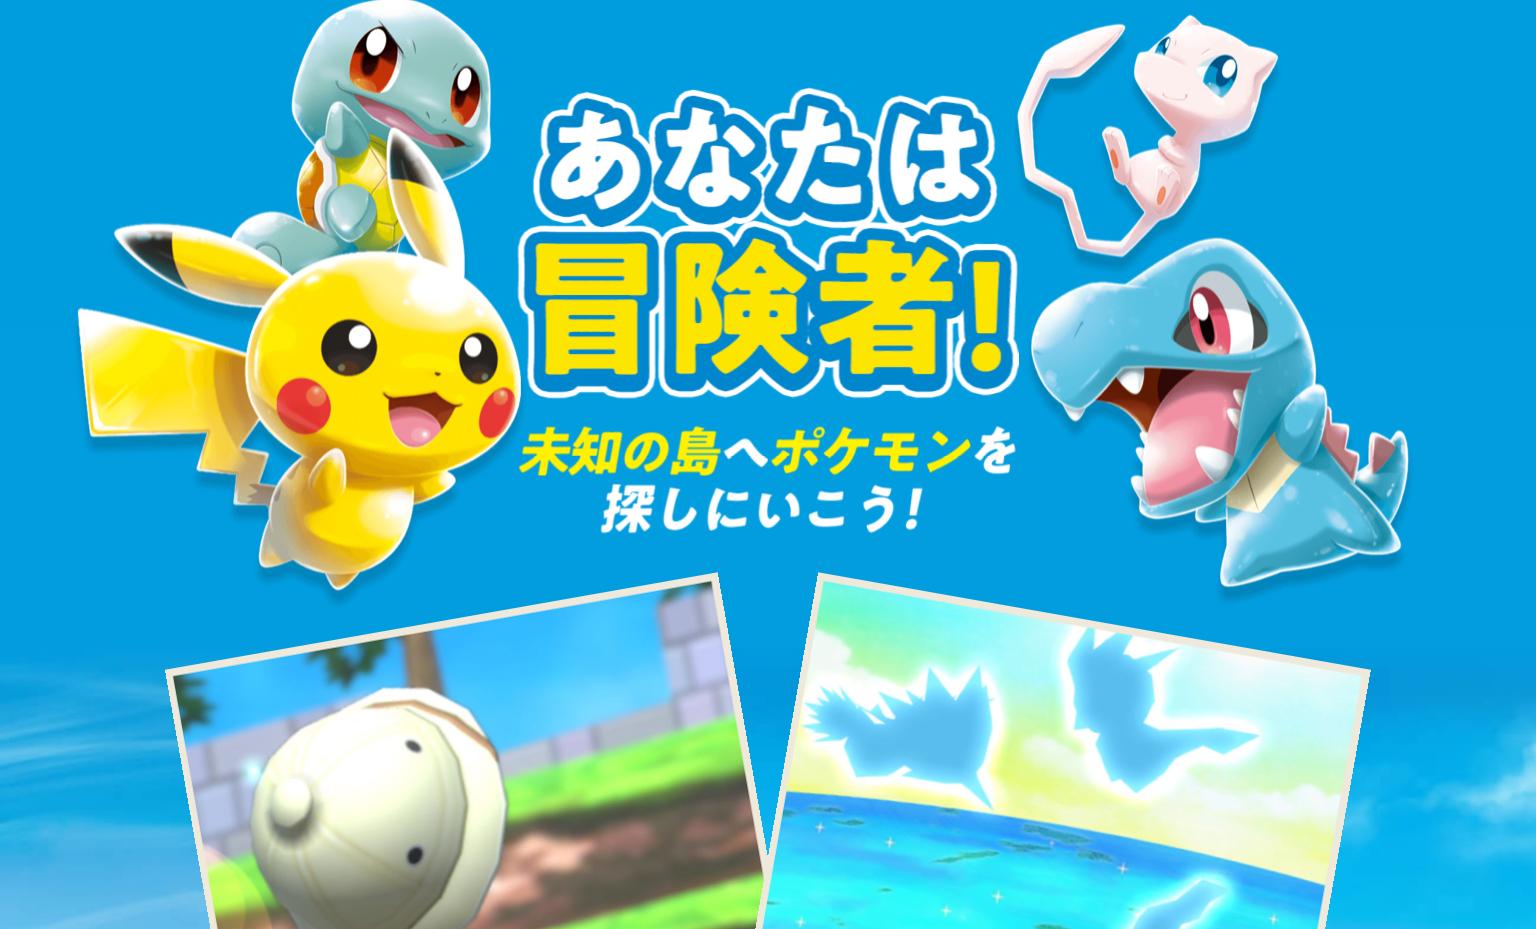 The Pokemon Company Just Released 'Pokemon Rumble Rush' in